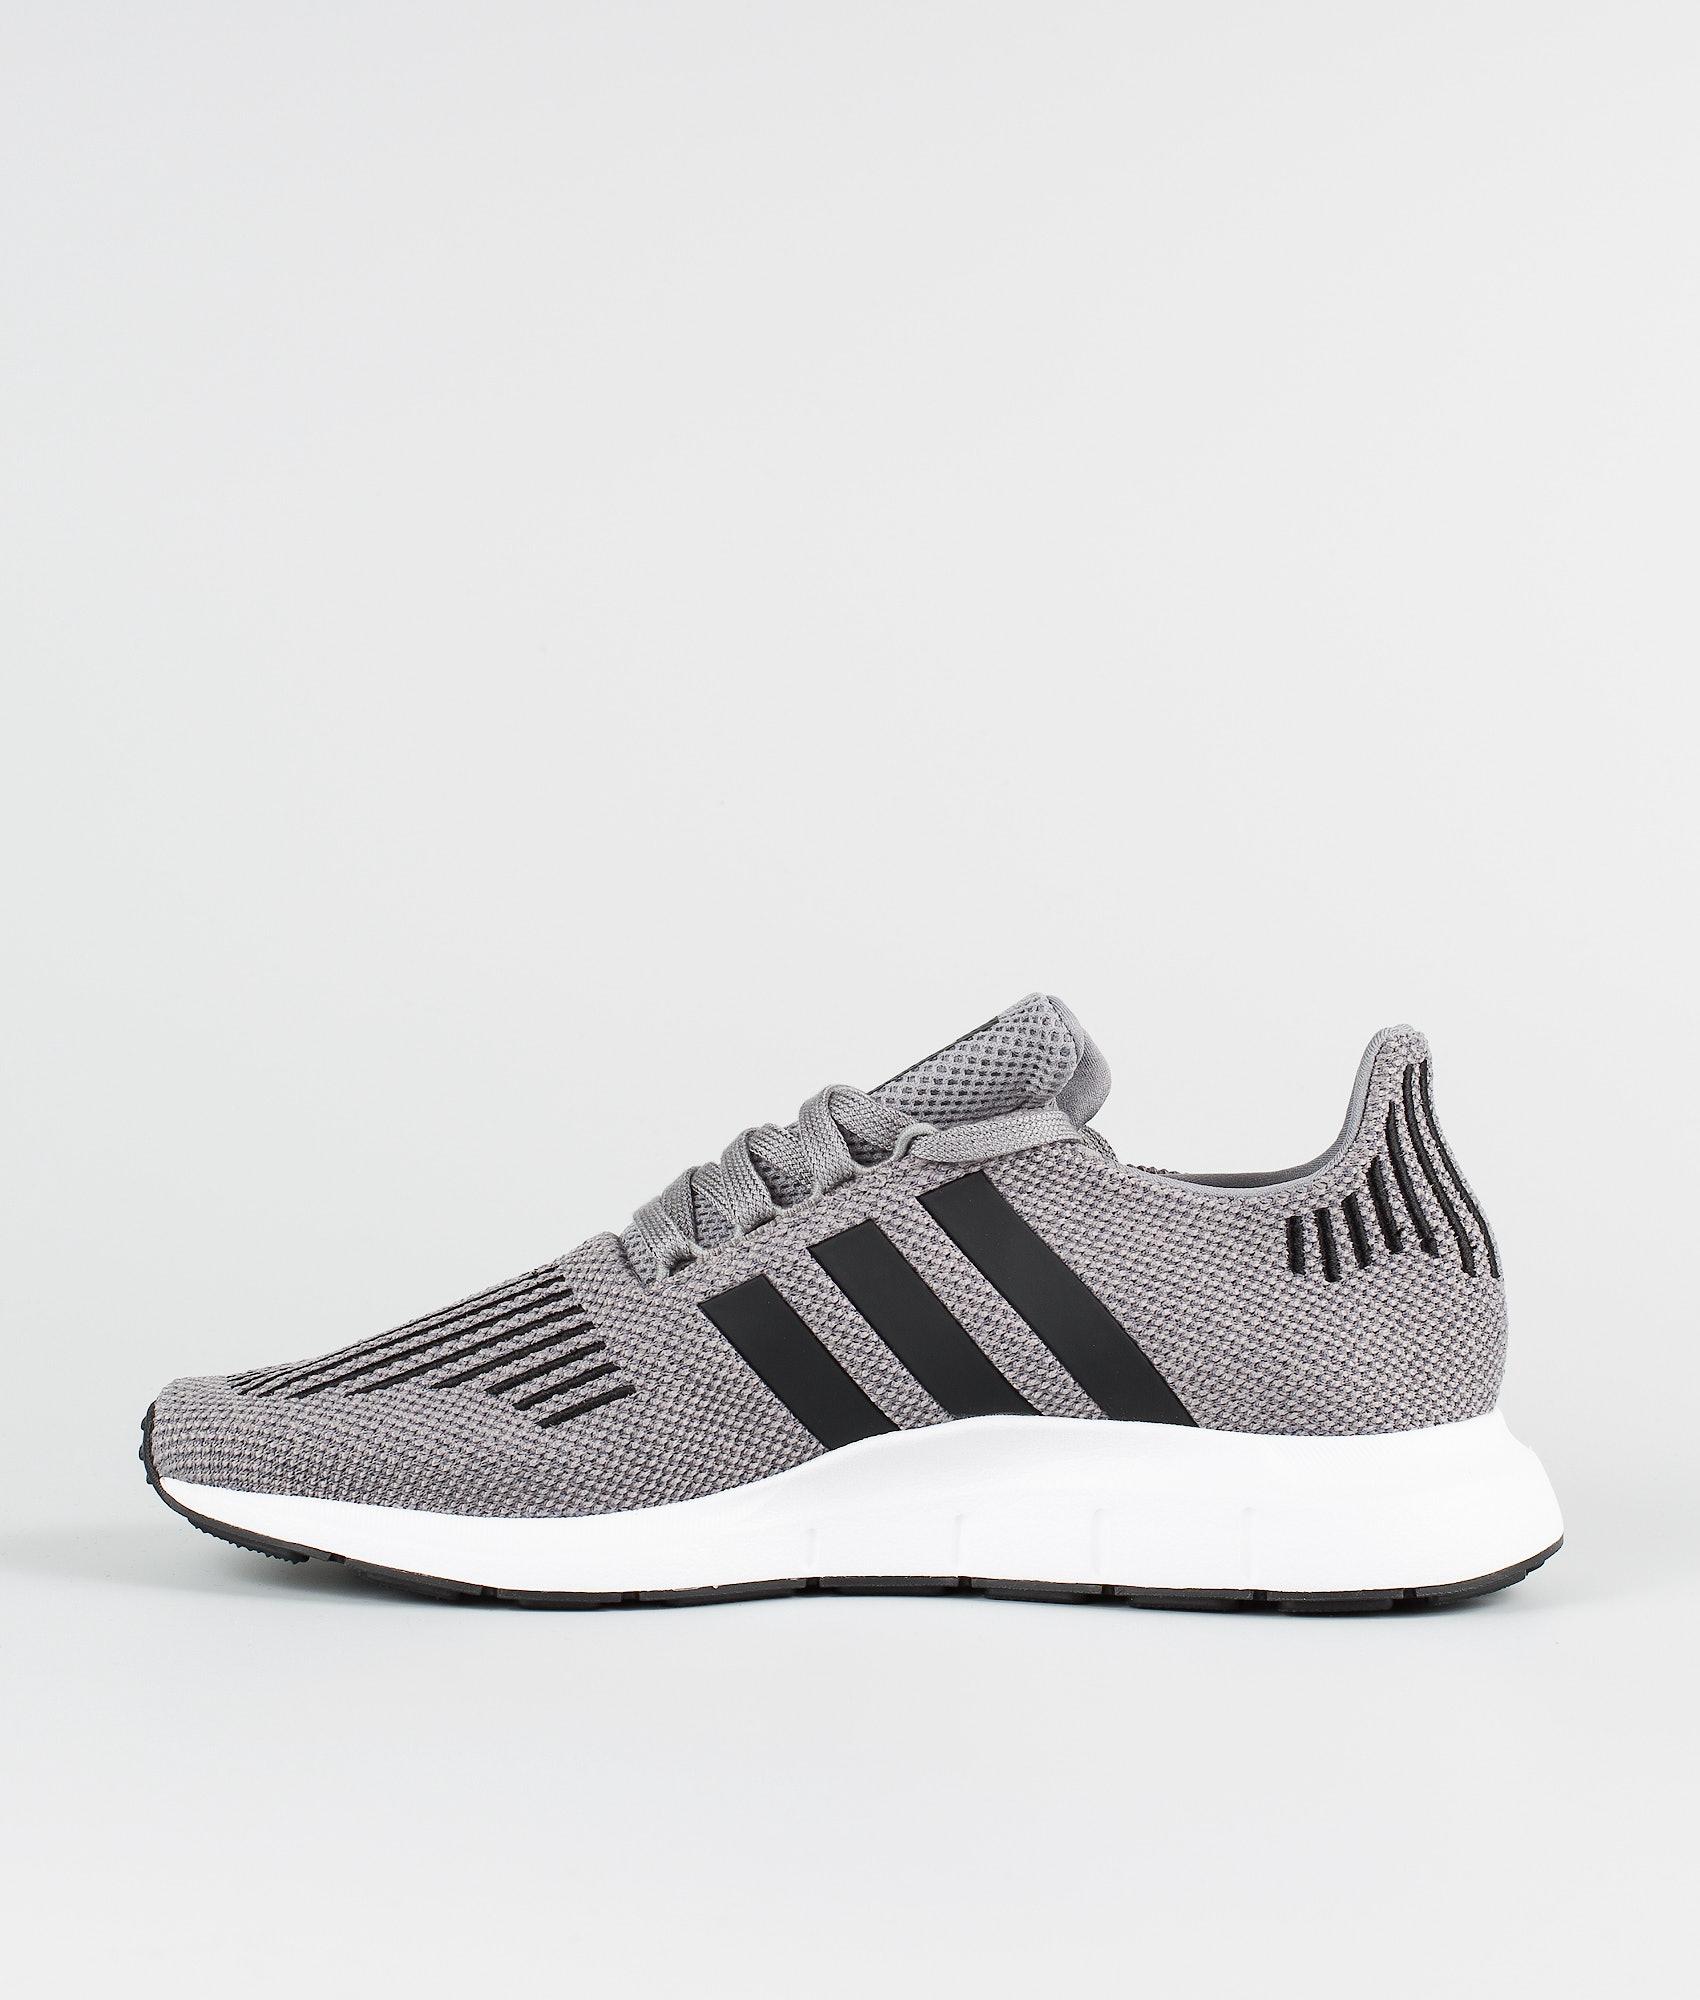 585cf57b9af07 Adidas Originals Swift Run Shoes Grey Heather Core Black Medium Grey ...